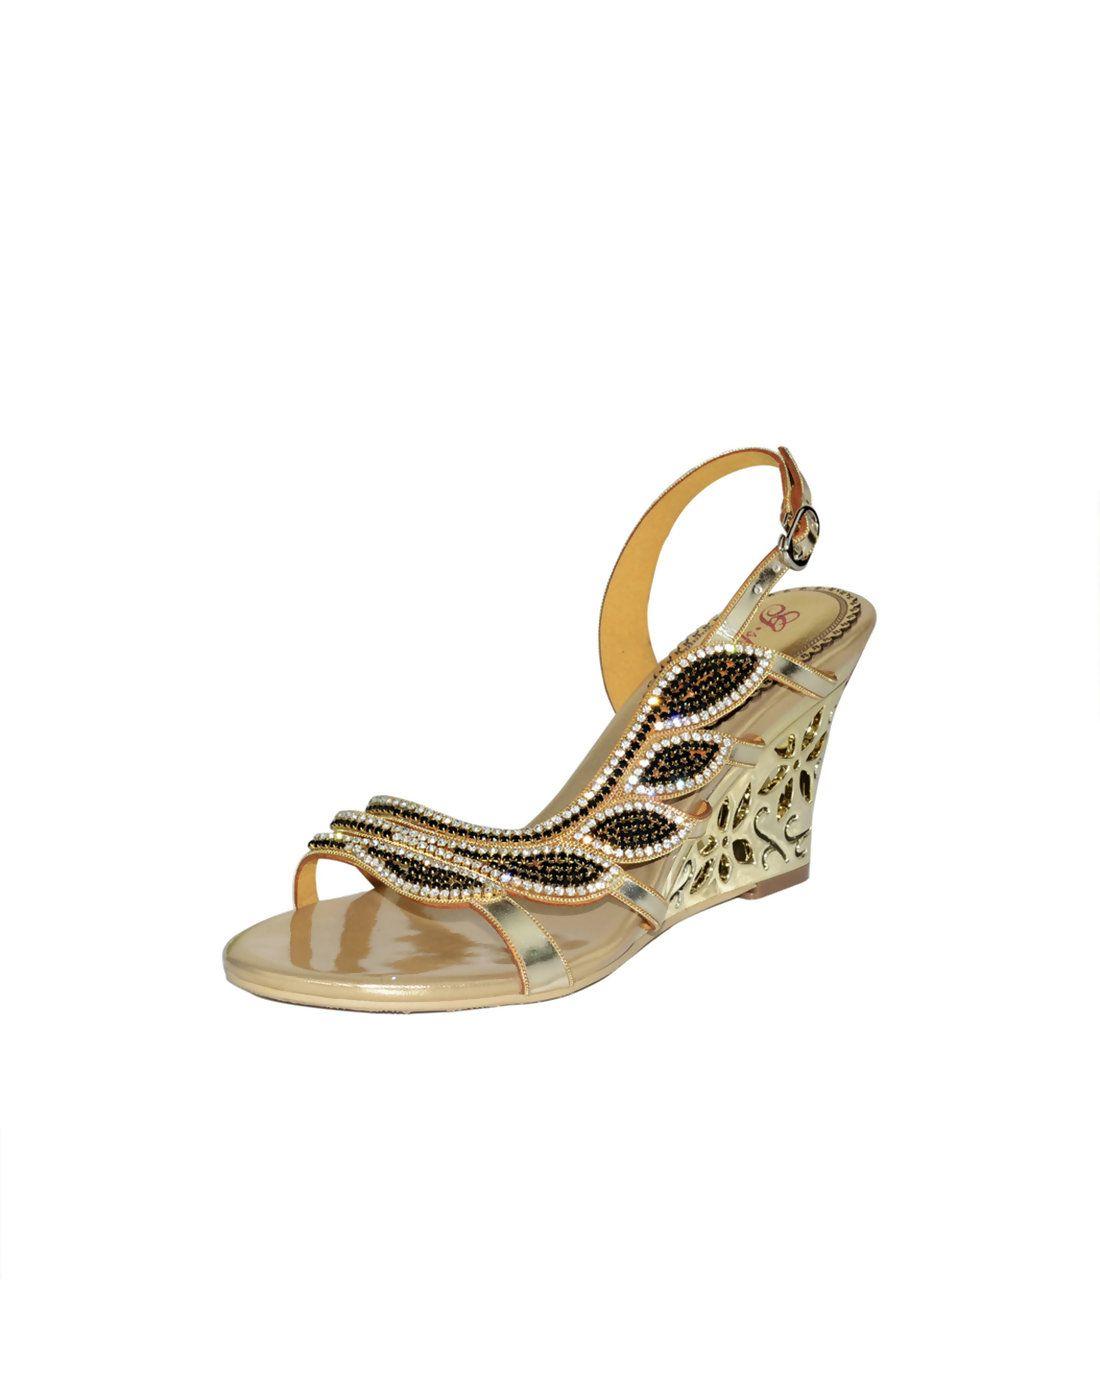 9b0034a6be72  AdoreWe  VIPme (VIPSHOP Global) Mens - G·sparrow Diamond Embellished  Wedge Heel Sandals Open Toe Gold - AdoreWe.com